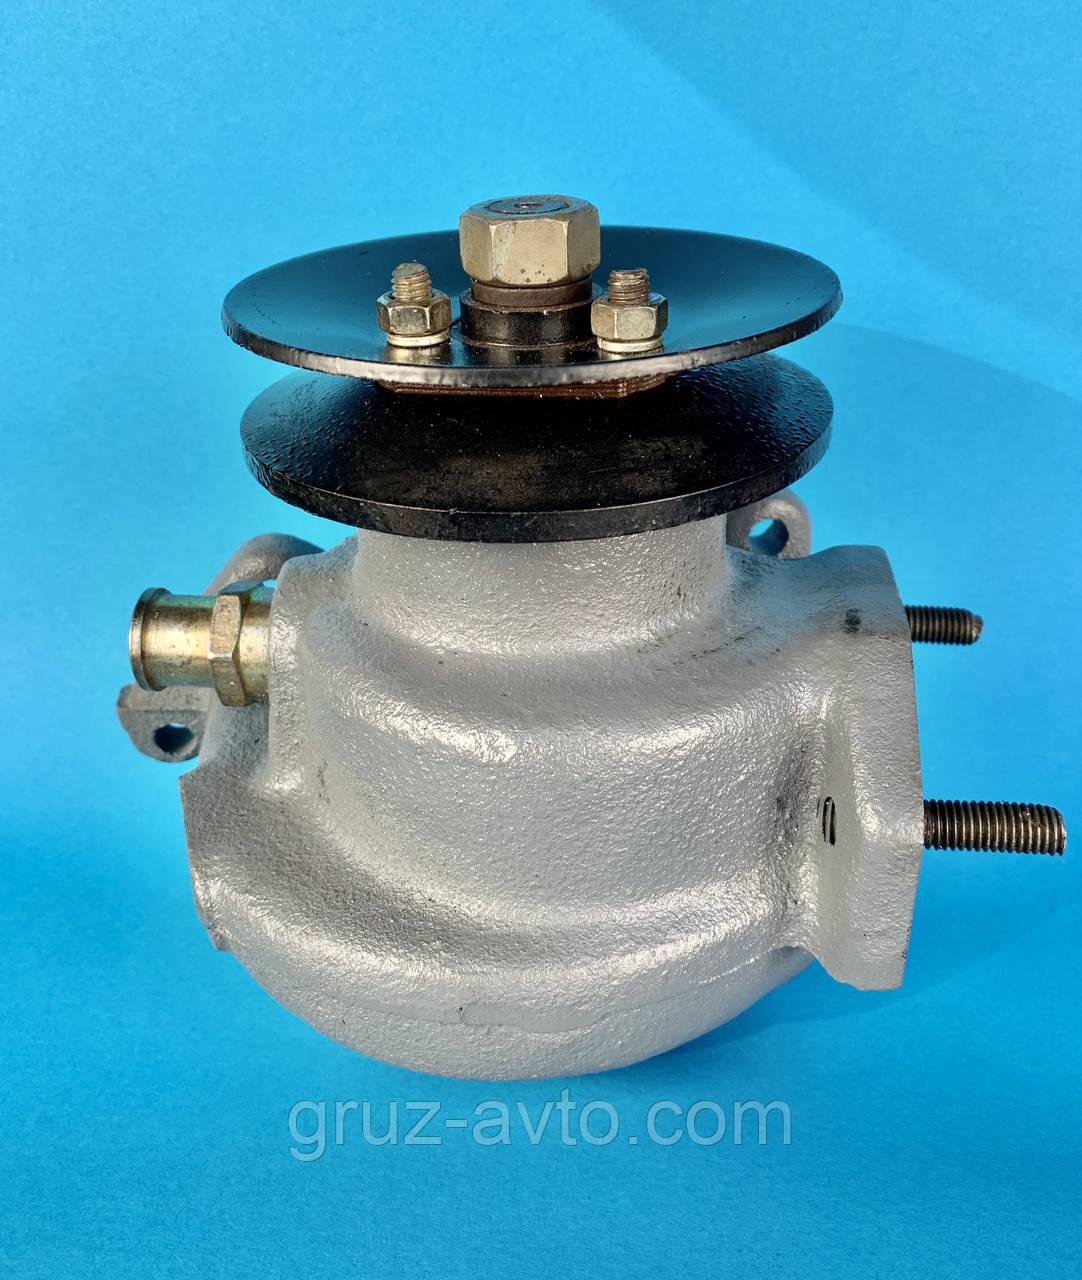 Насос водяной ЯМЗ-236 ЯМЗ-238 или помпа КрАЗ МАЗ / 236-1307010